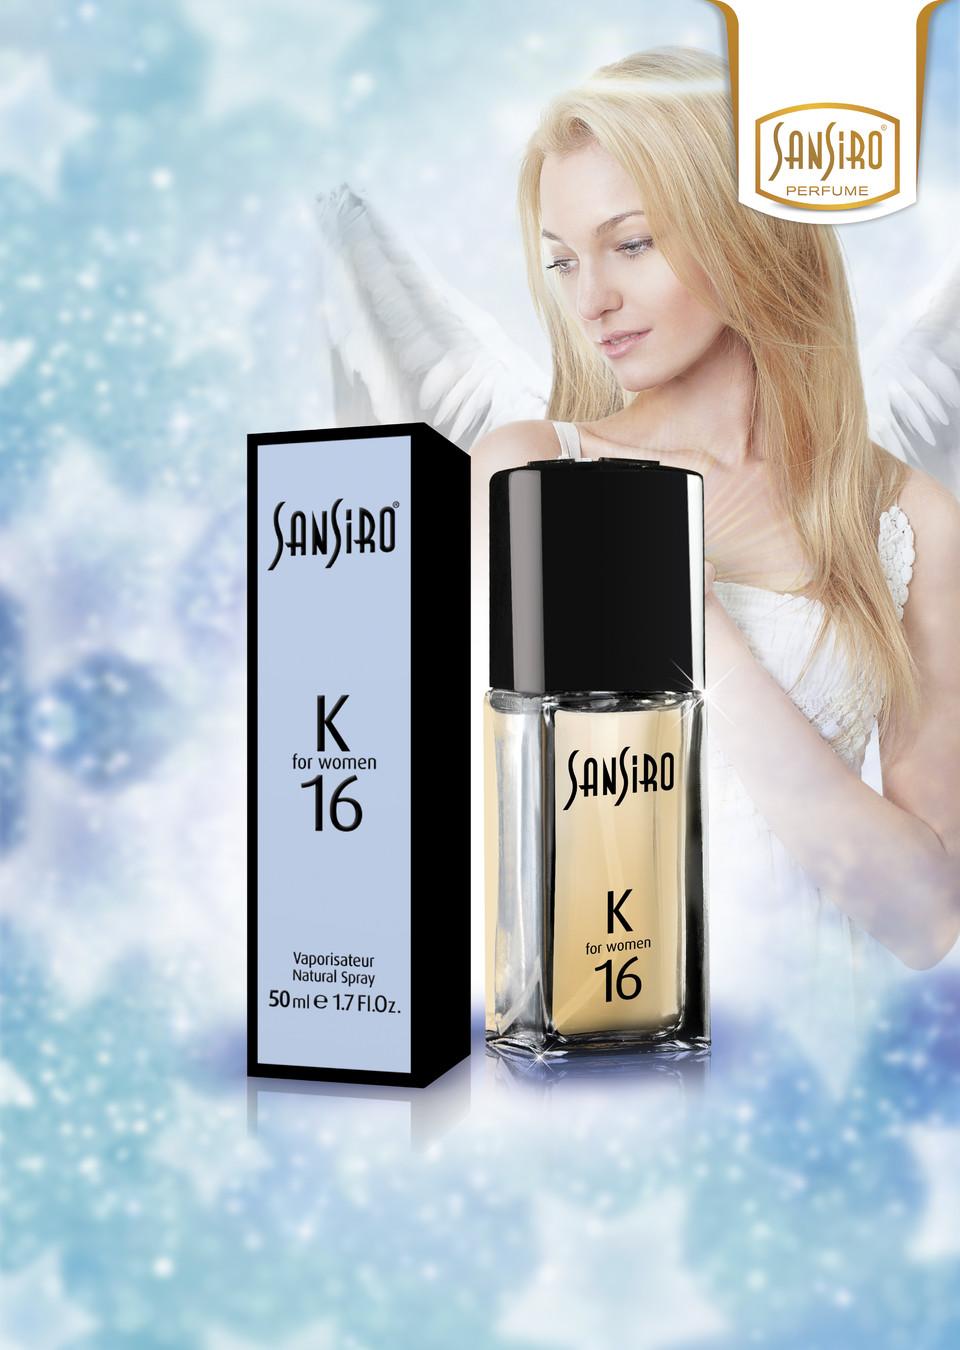 Sansiro Perfume - For Women - Melek Woman (K16)